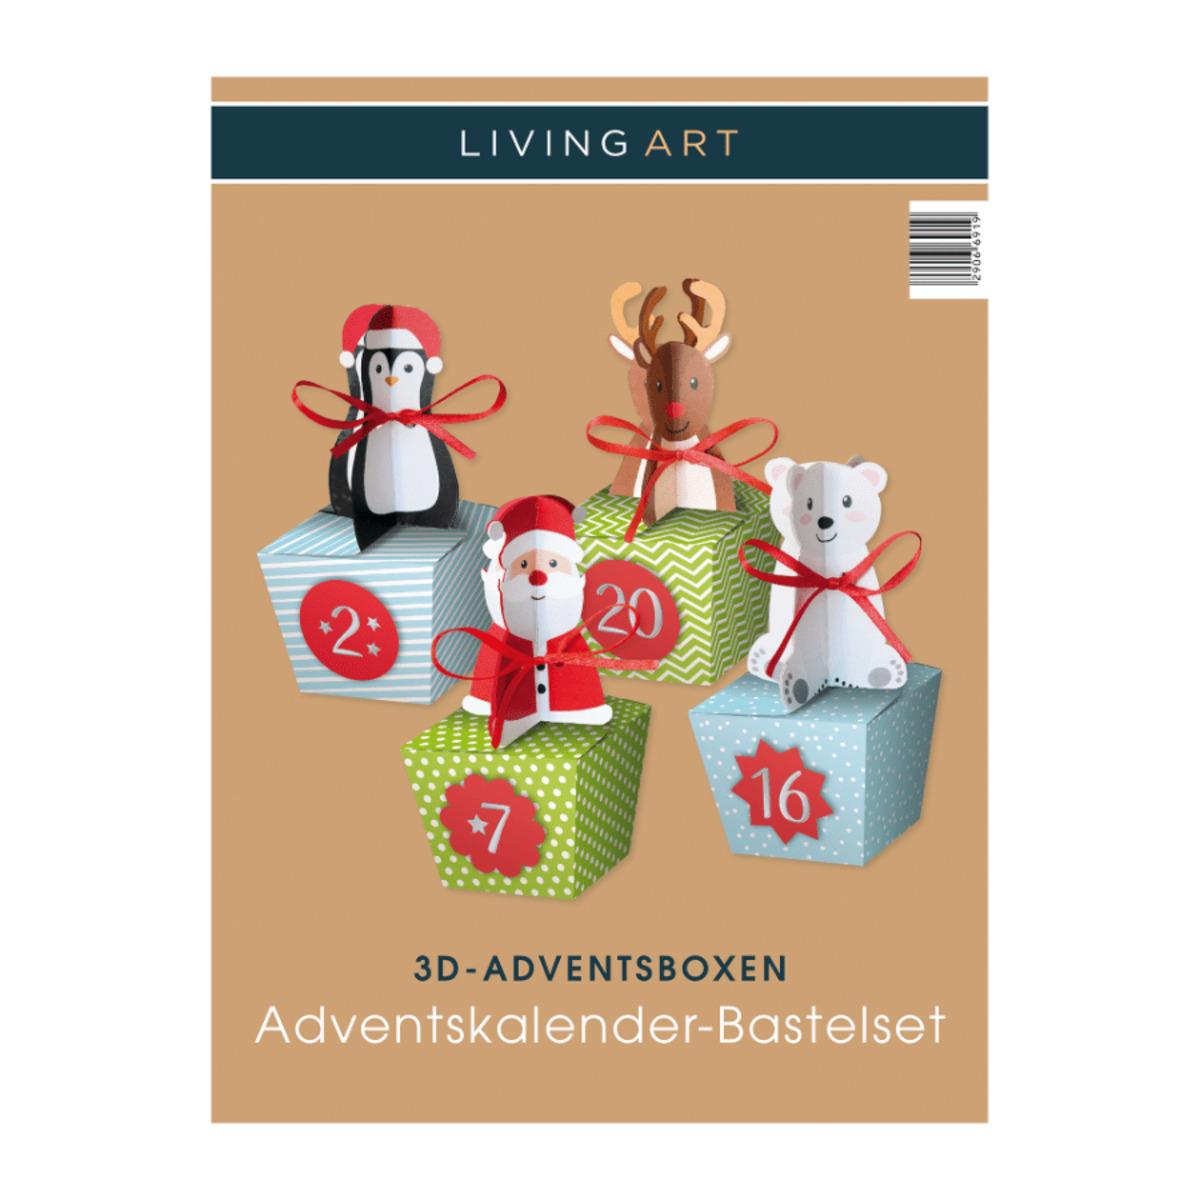 Bild 5 von LIVING ART     Adventskalender-Bastelset